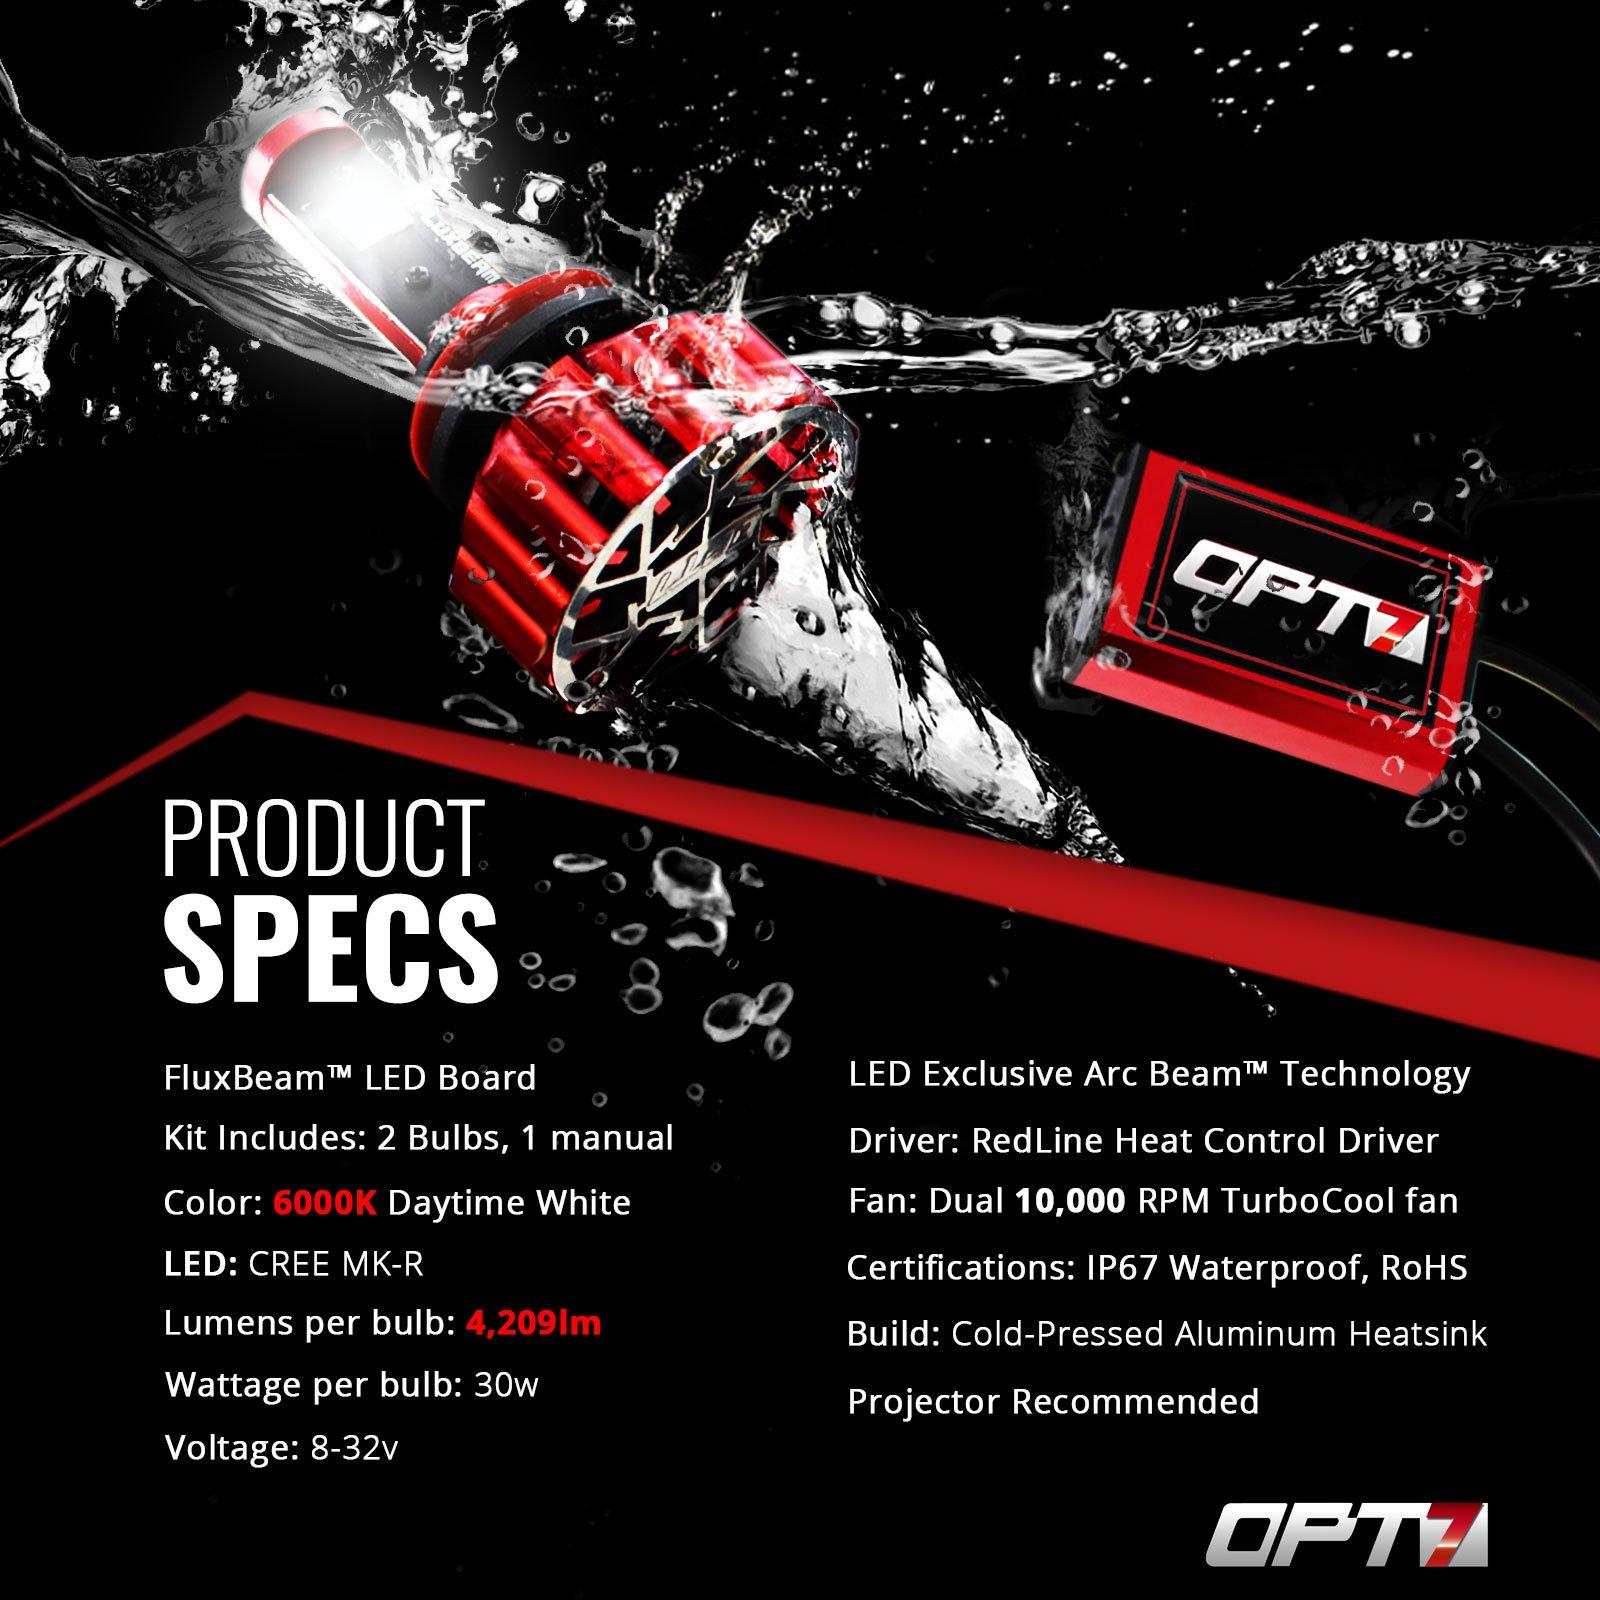 OPT7 Fluxbeam X 9007 LED Headlight Bulbs w/Arc-Beam Lens - 8,400LM 6000K Daytime White - All Bulb Sizes - 80w - 2 Year Warranty by OPT7 (Image #8)